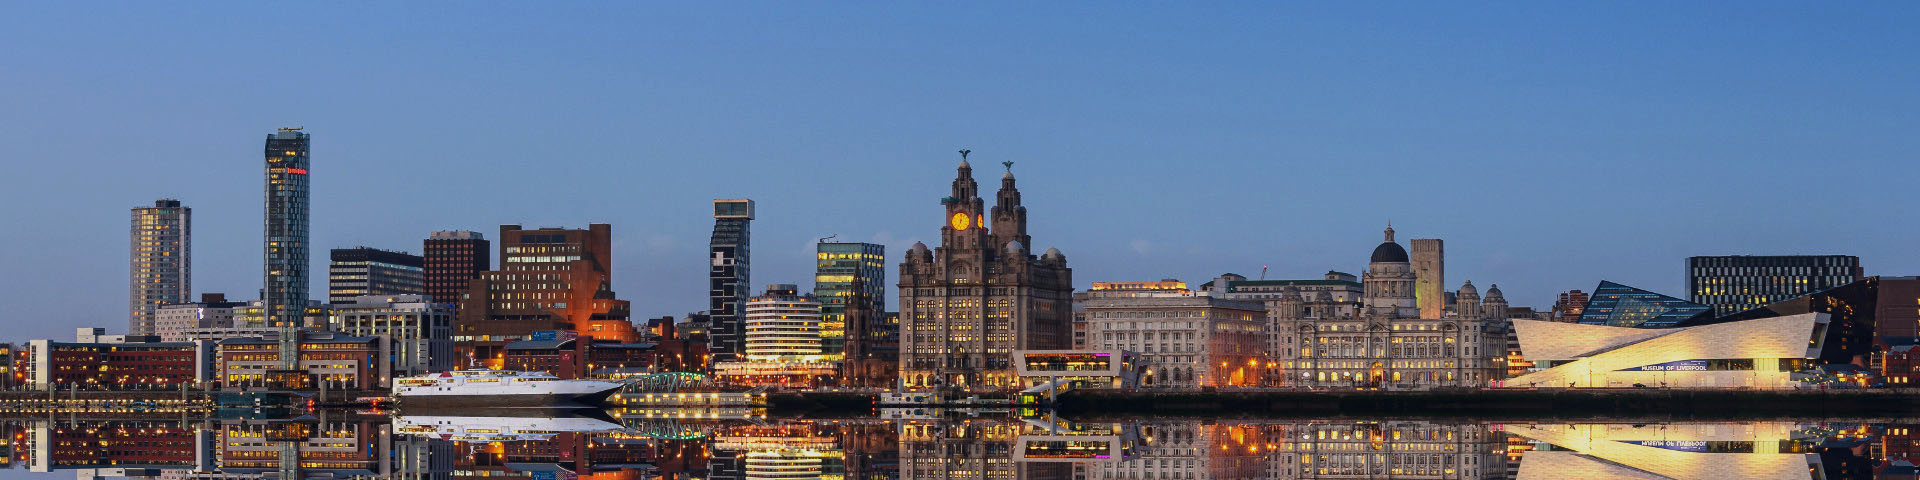 Liverpool skyline hero edit